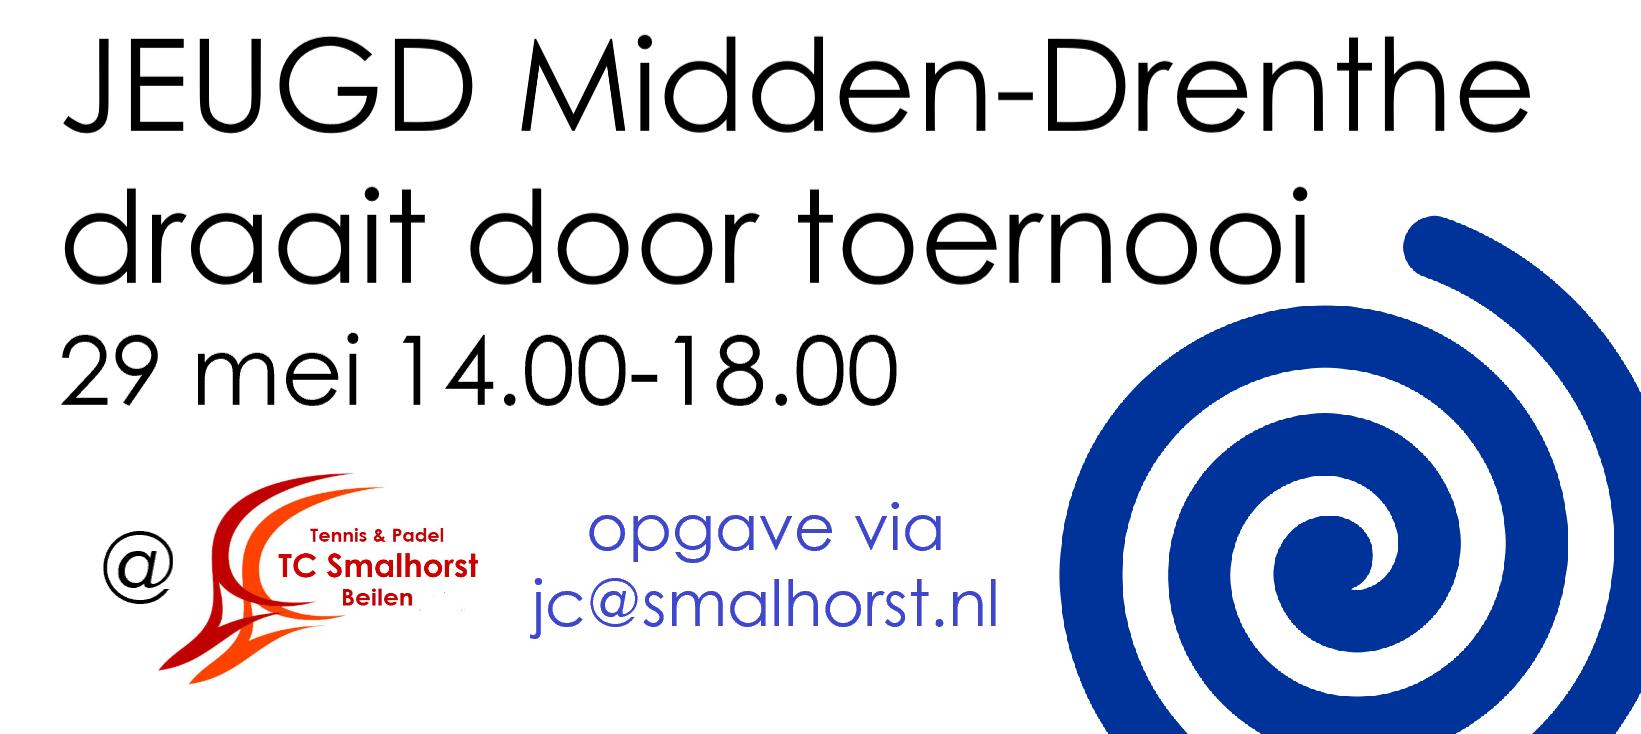 Tennis toernooi - Jeugd Midden-Drenthe